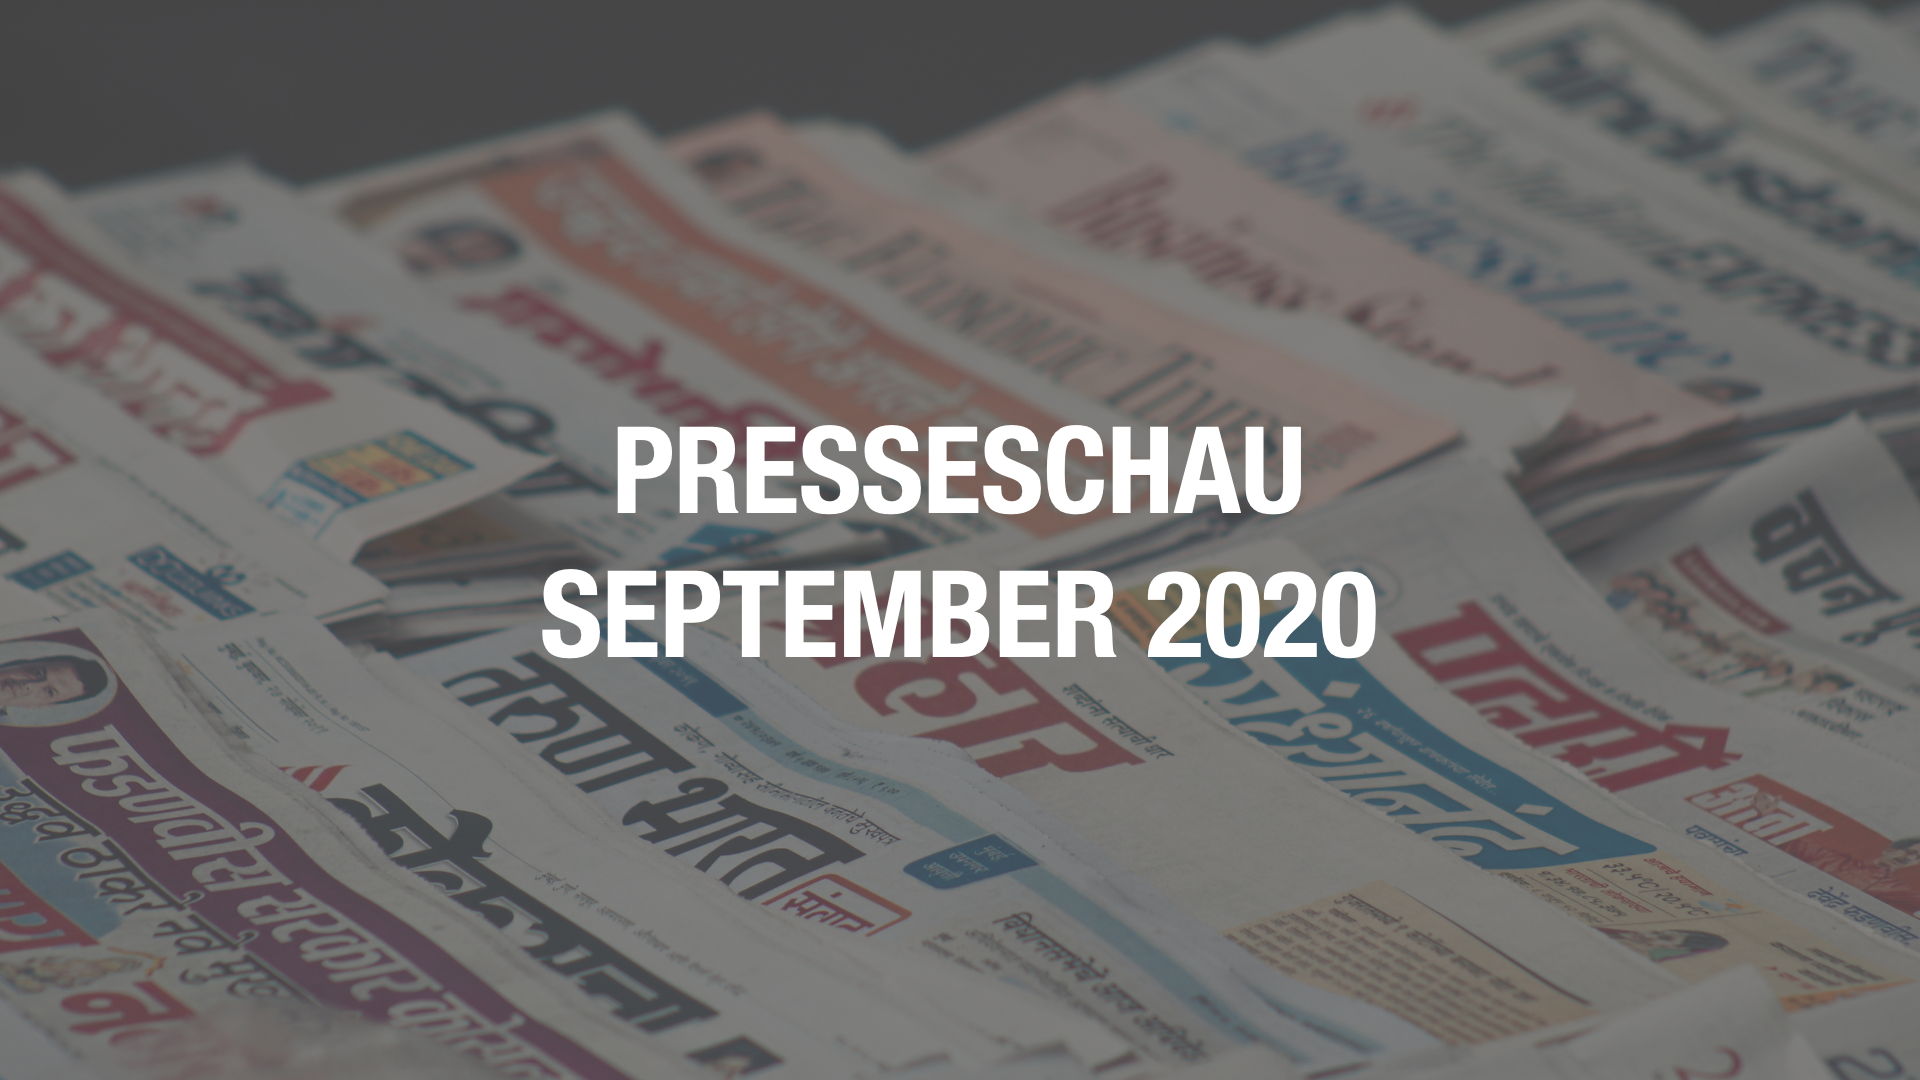 Presseschau: Coworking im September 2020